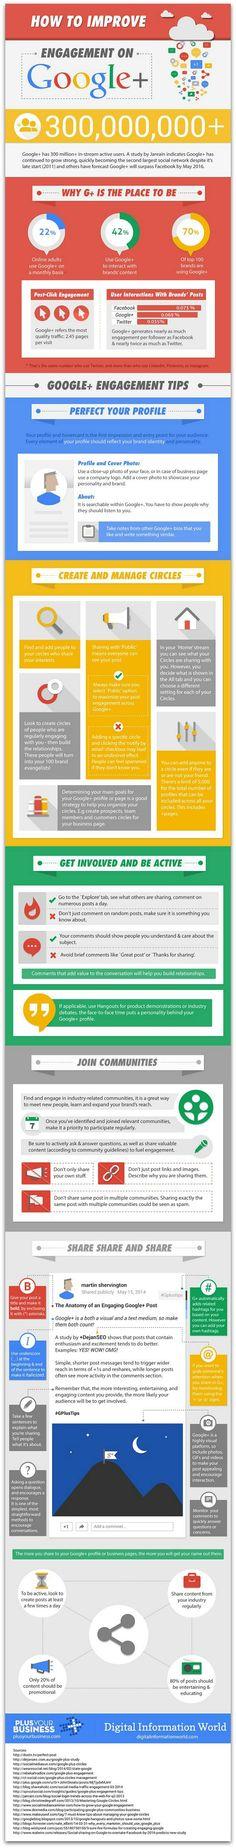 5 ways to increase engagement on Google+ #Infographic   via #BornToBeSocial - Pinterest Marketing